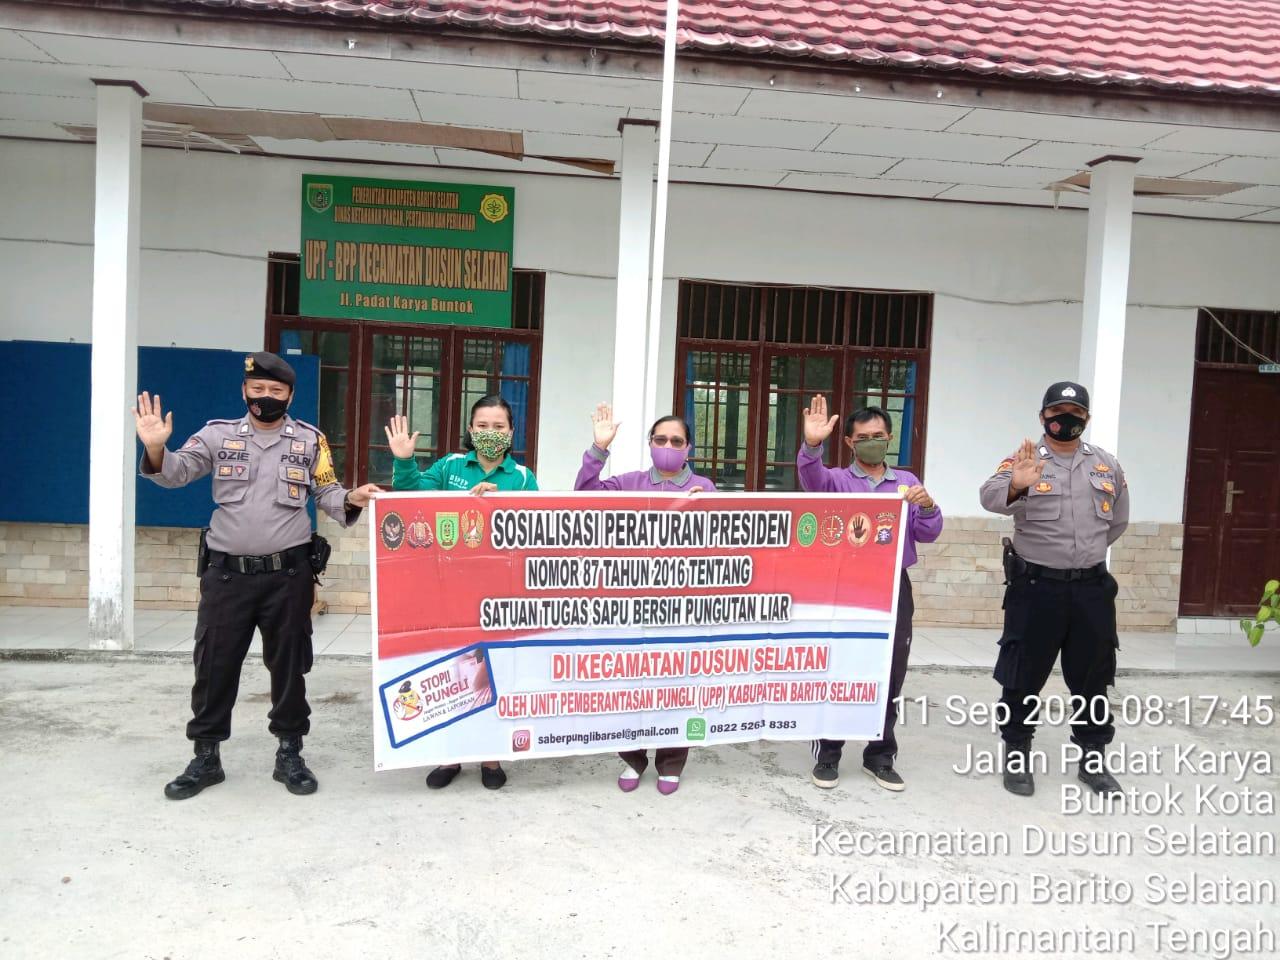 Perangi Pungli, Personel Polsek Dusel Laksanakan Sosialisasi Perpres Nomor 87 Tahun 2016